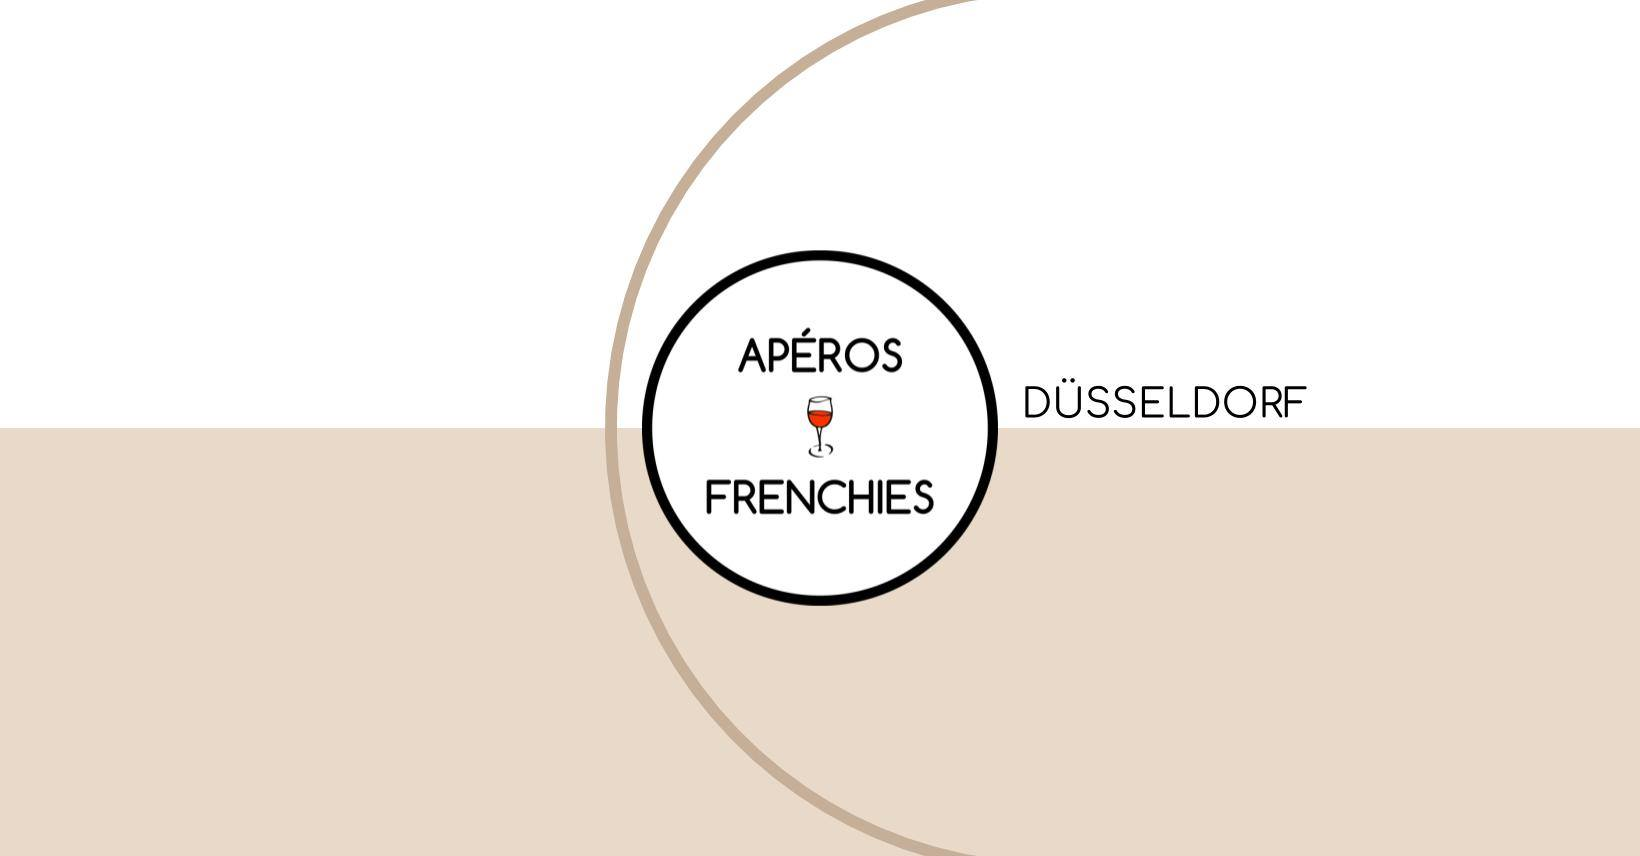 aperosfrenchies-dusseldorf-cover